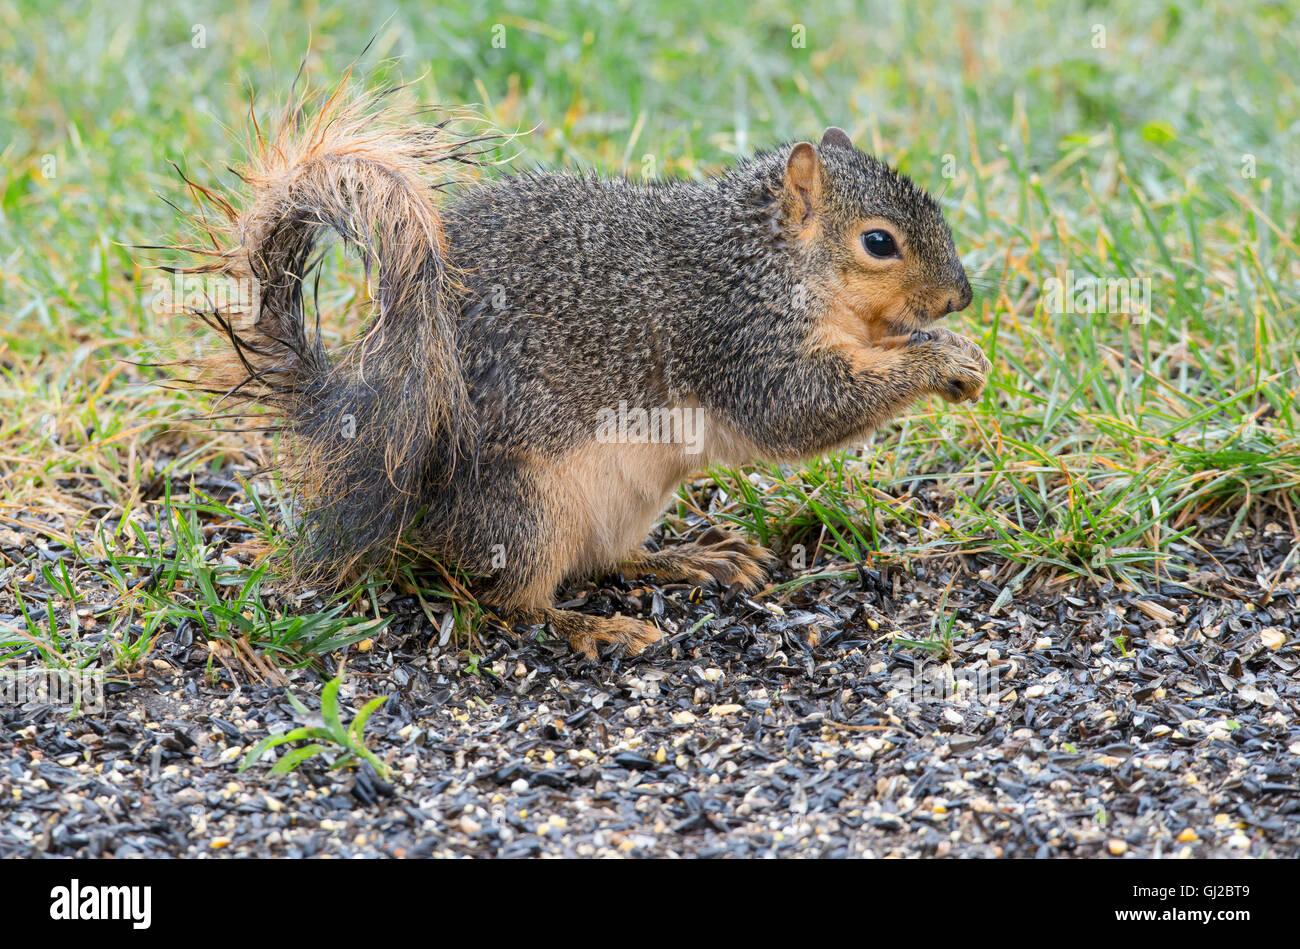 Eastern Fox Squirrel (Sciurus niger) feeding on bird seed, near bird feeder, park, E North America - Stock Image